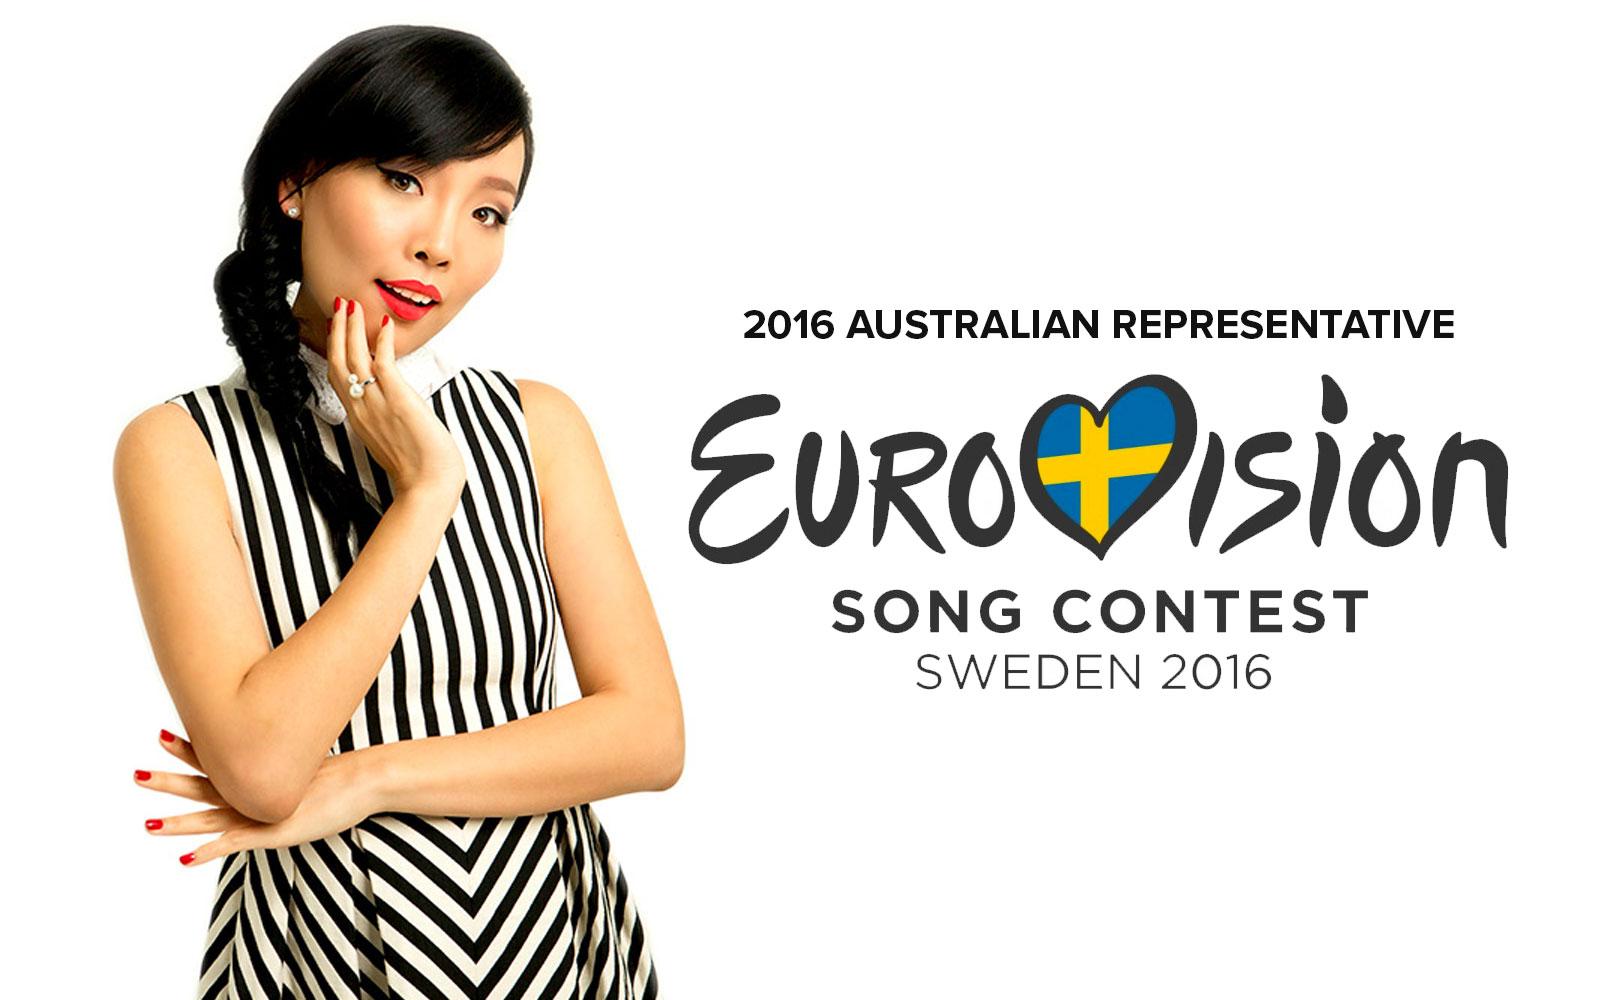 Dami Im to represent Australia in Eurovision 2016 Stockholm Sweden